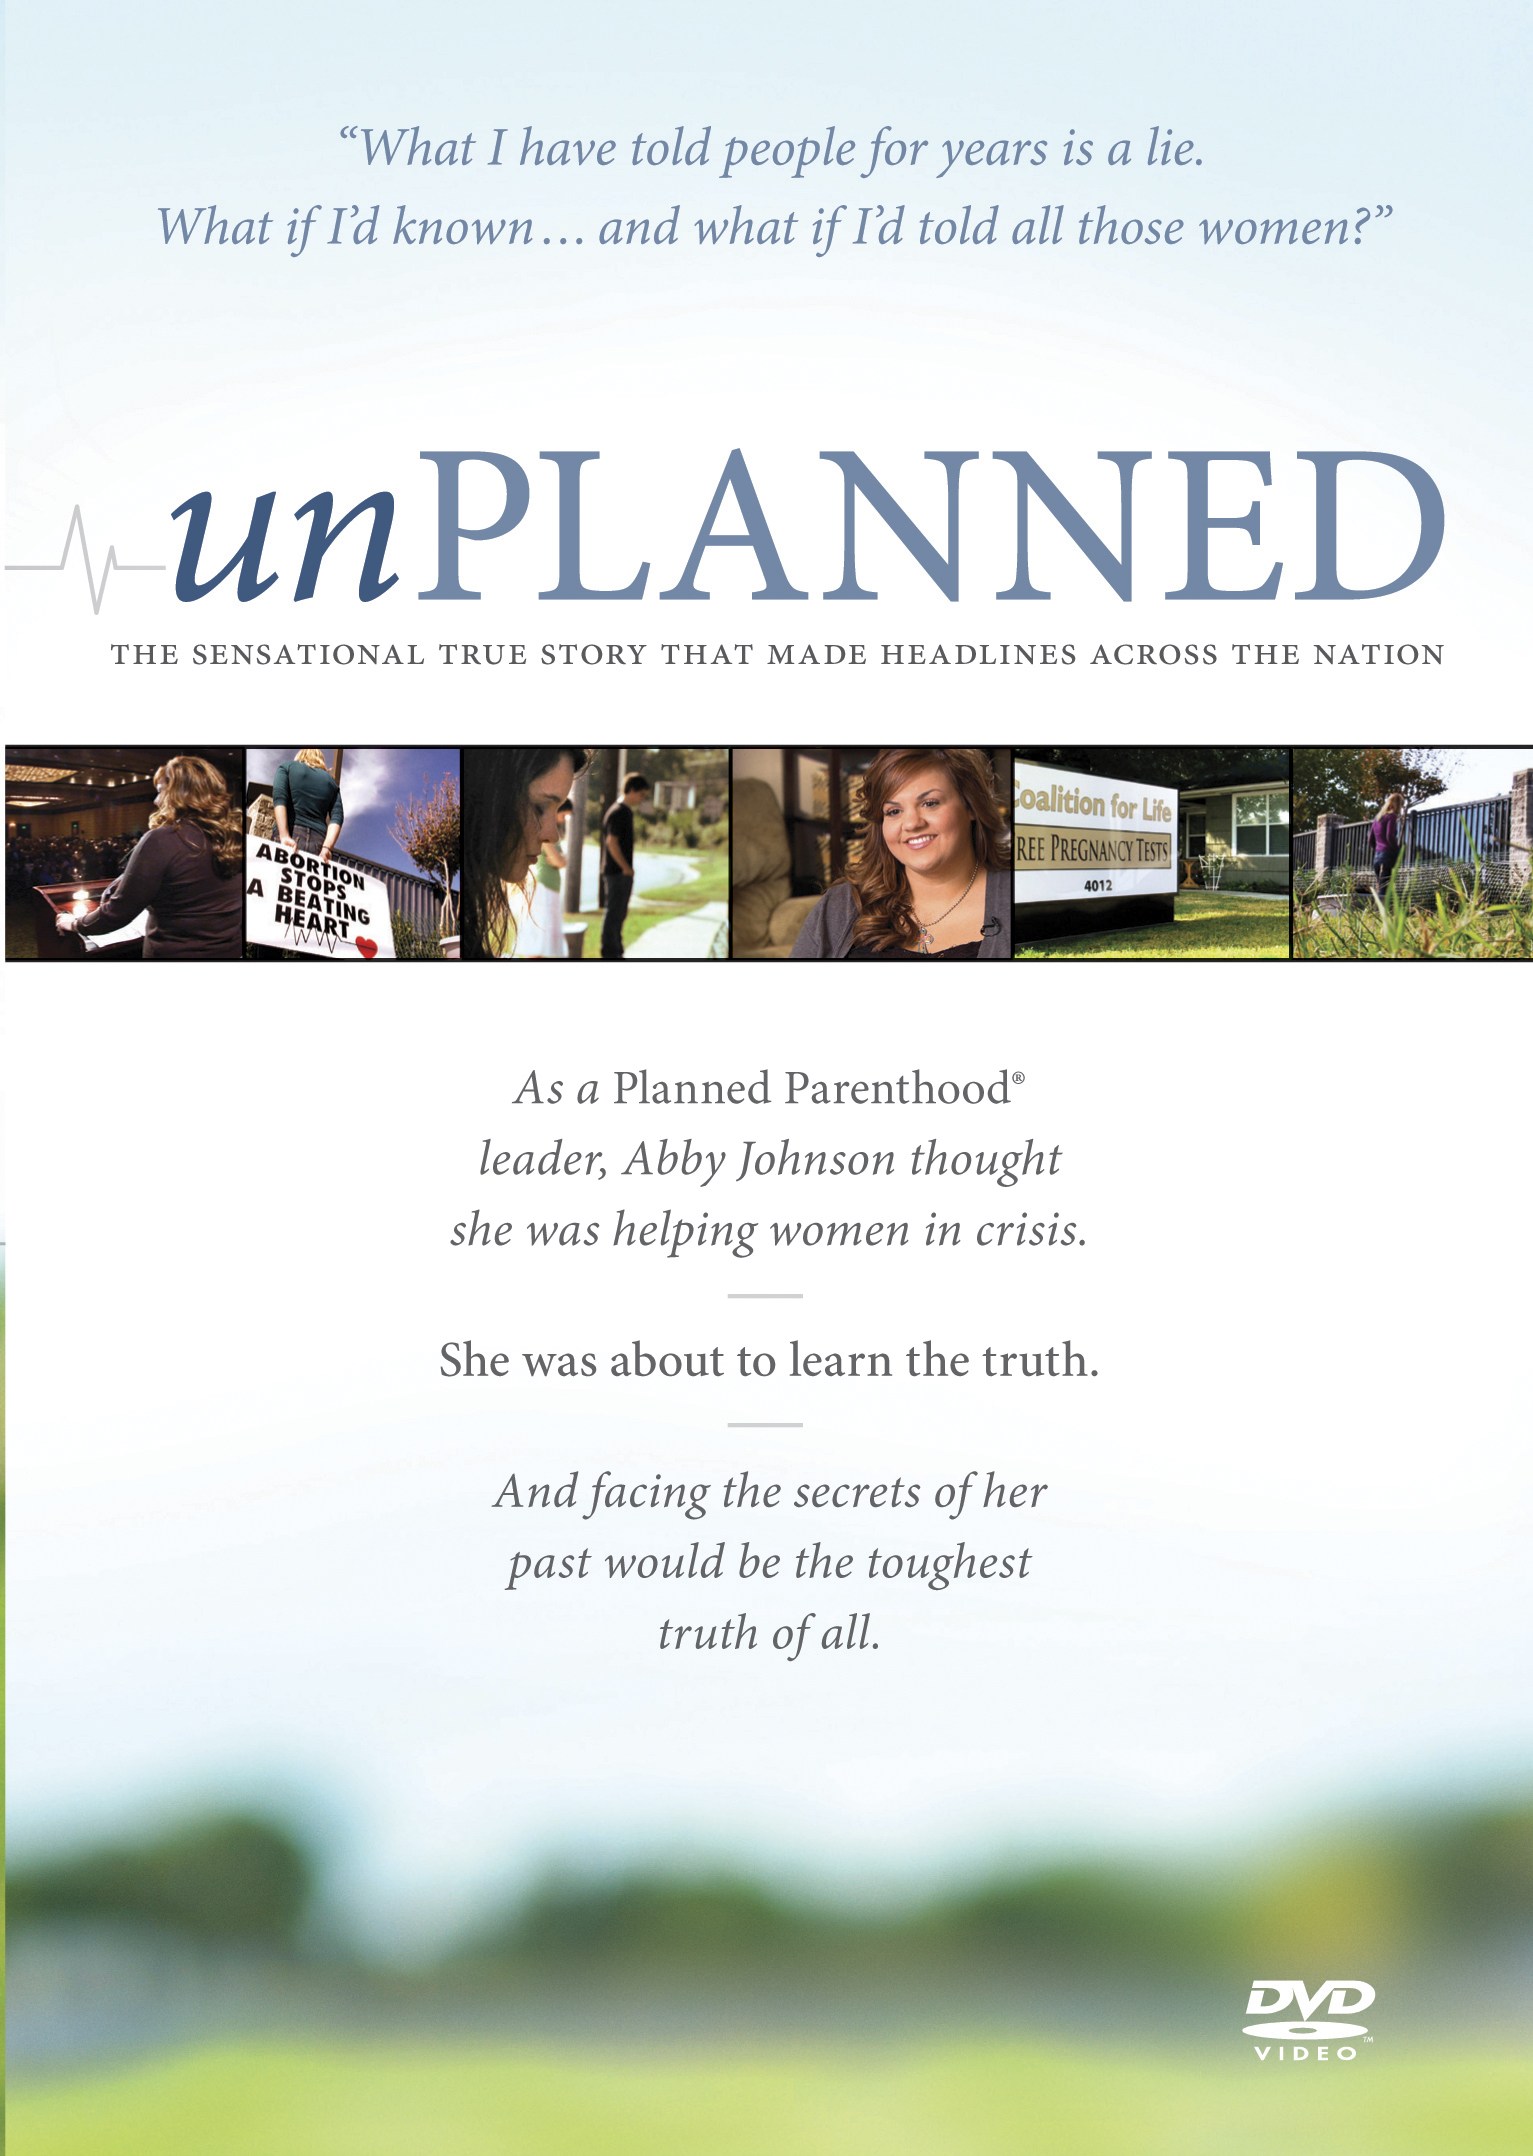 Image result for Unplanned dvd cover hi-res